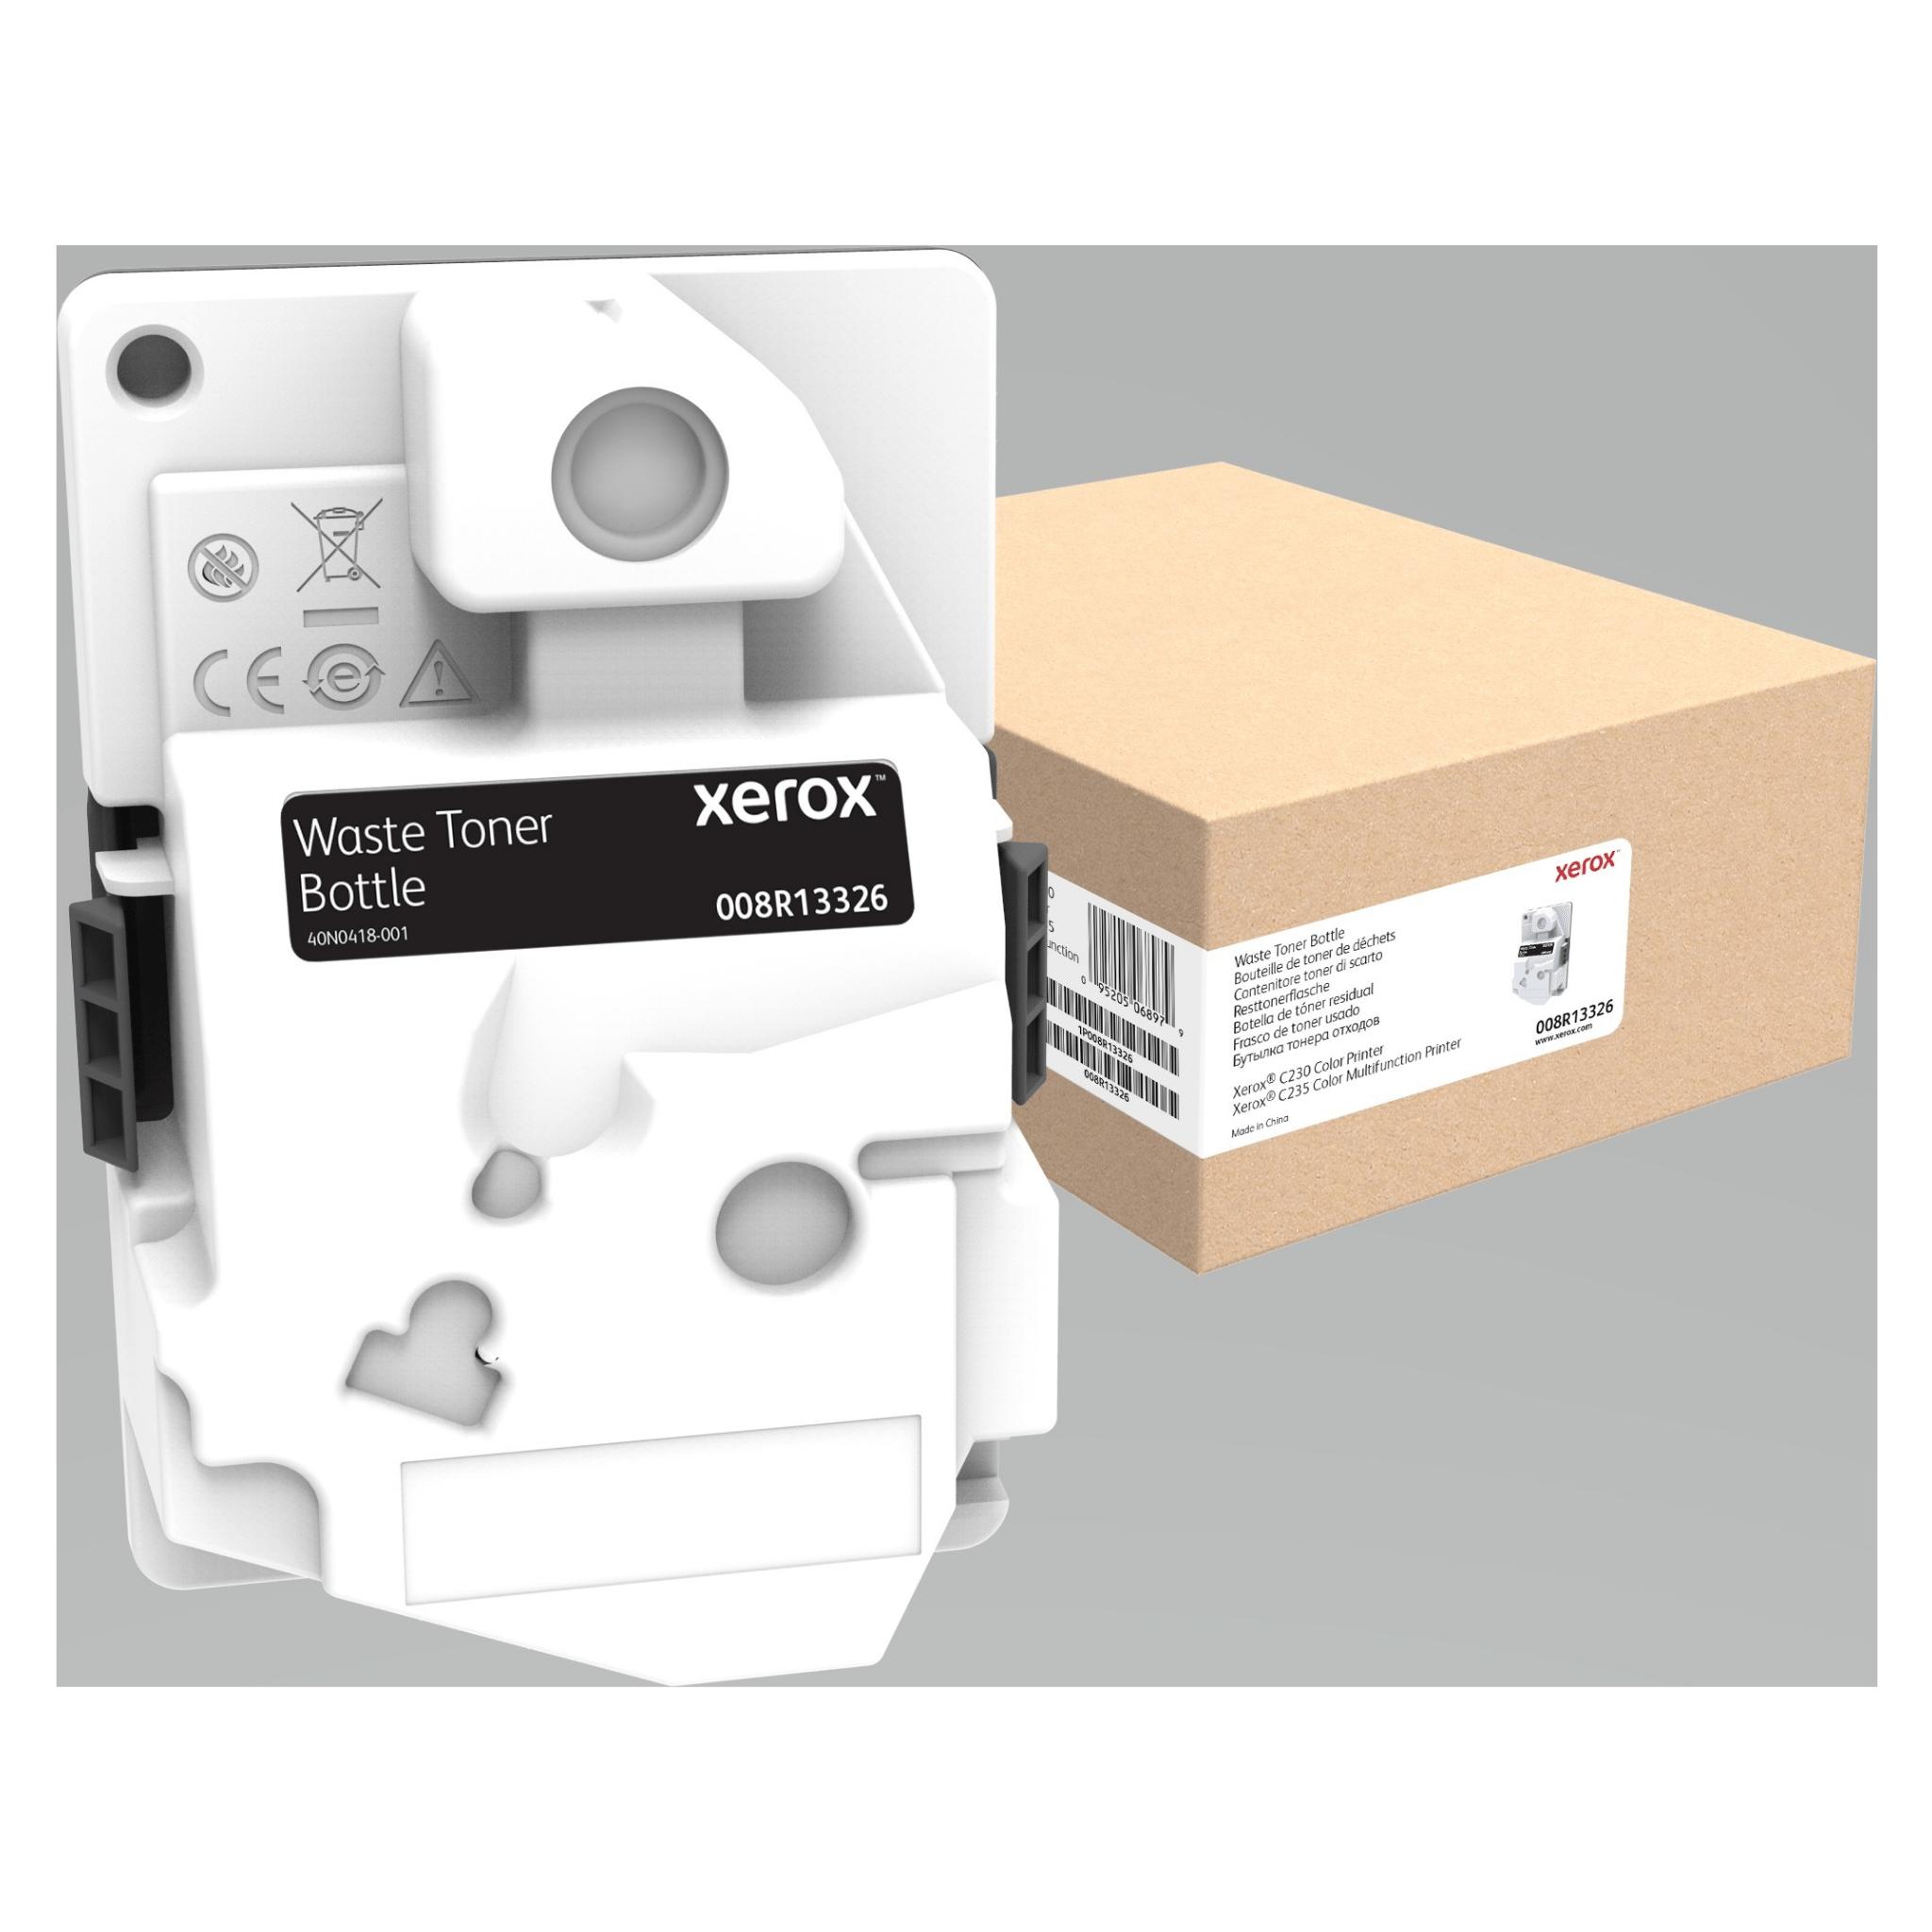 008R13326 - Vaschetta di Recupero Toner - Xerox® C230/C235